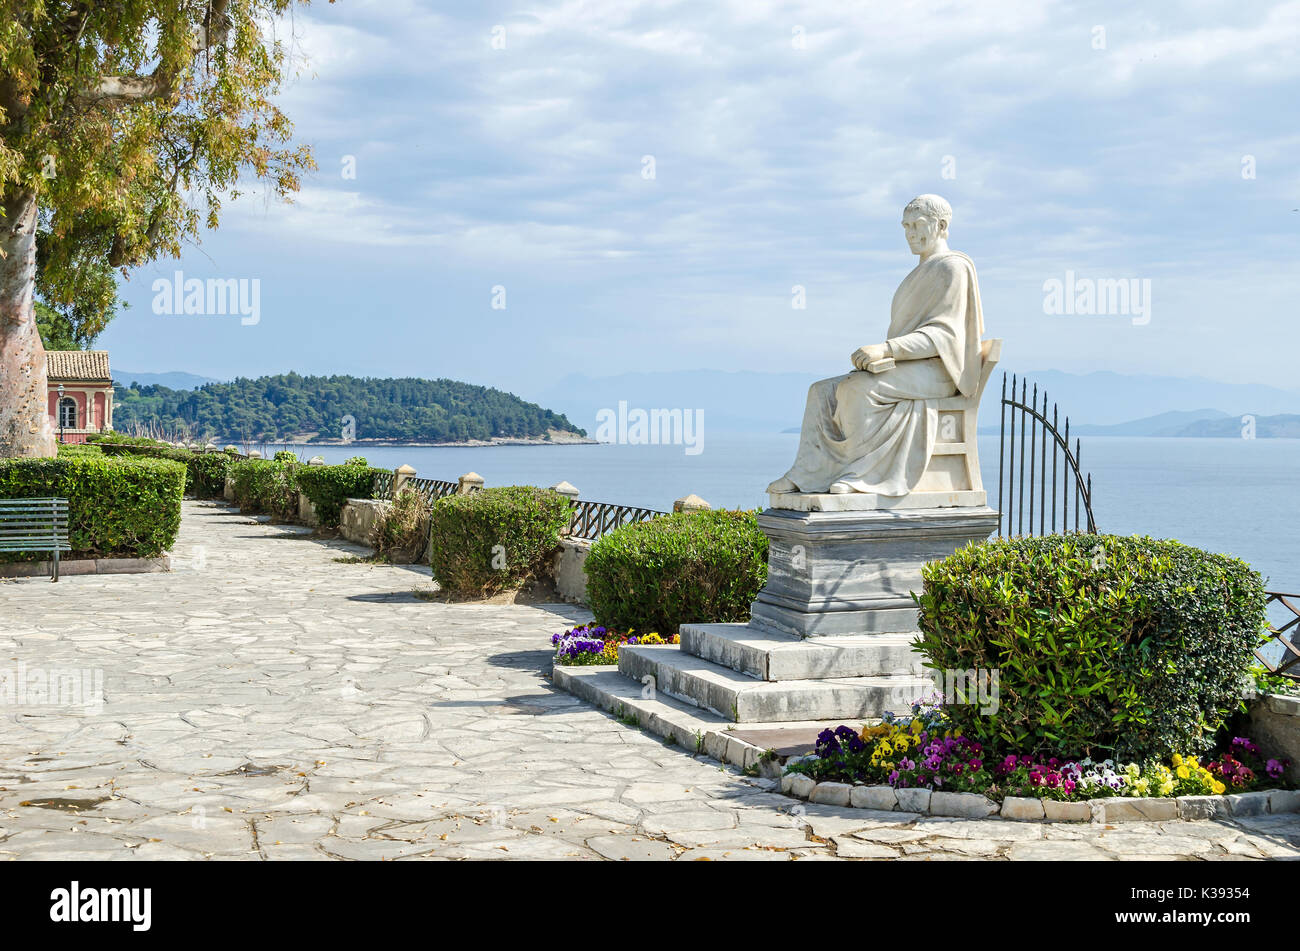 Statue of British High Commissioner Guilford in the Boschetto Park or Boschetto Garden in Corfu Town, Greece. - Stock Image